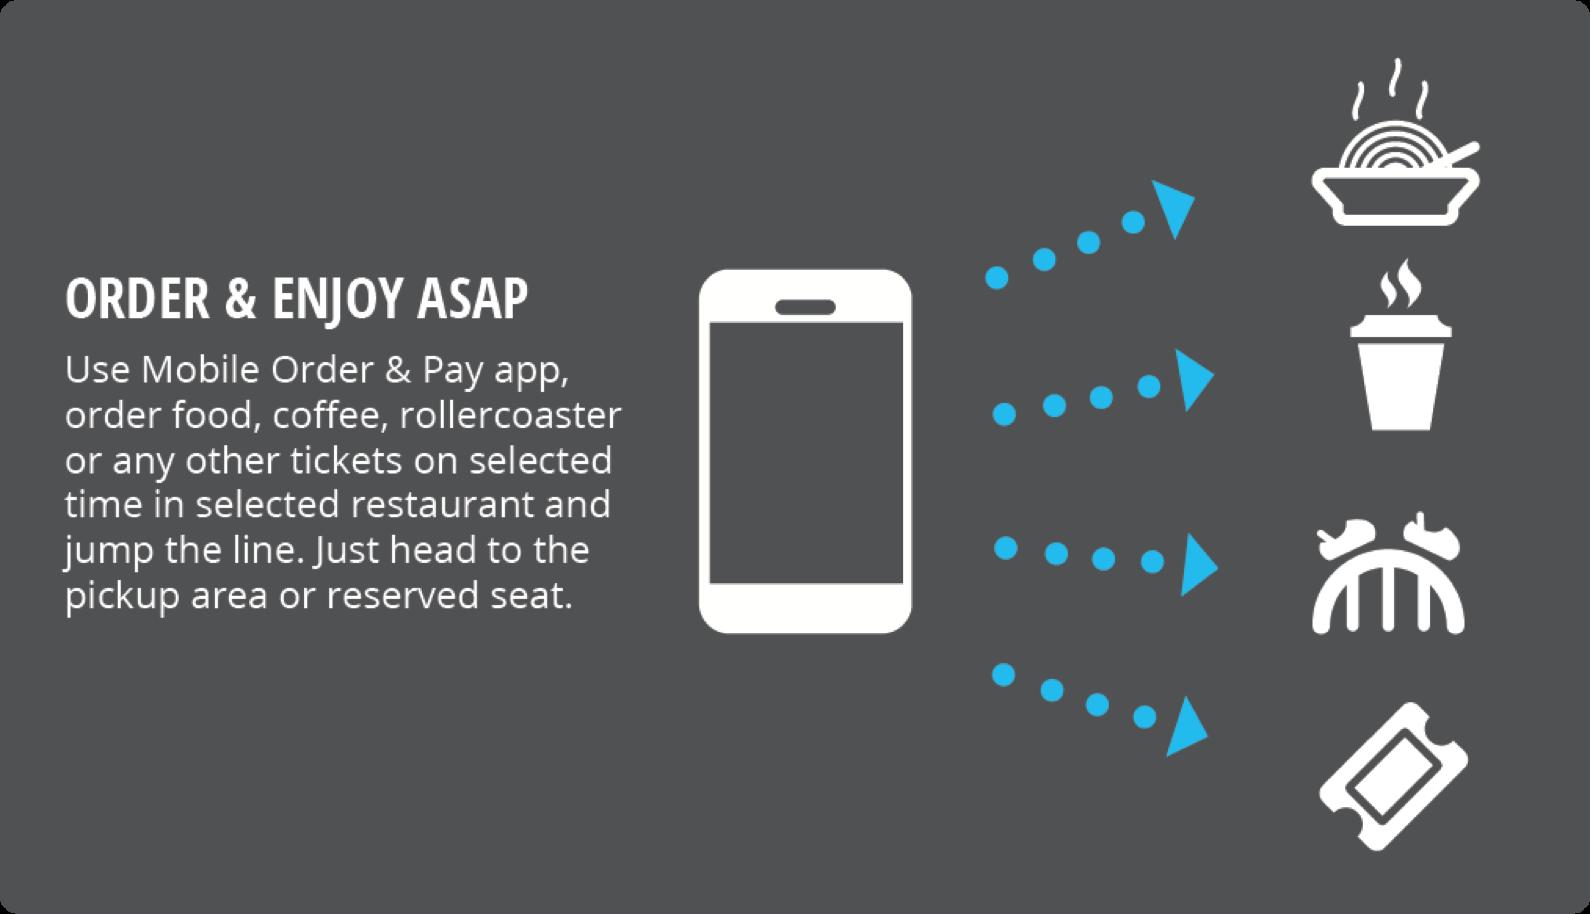 Order & Pay Mobile App Scheme